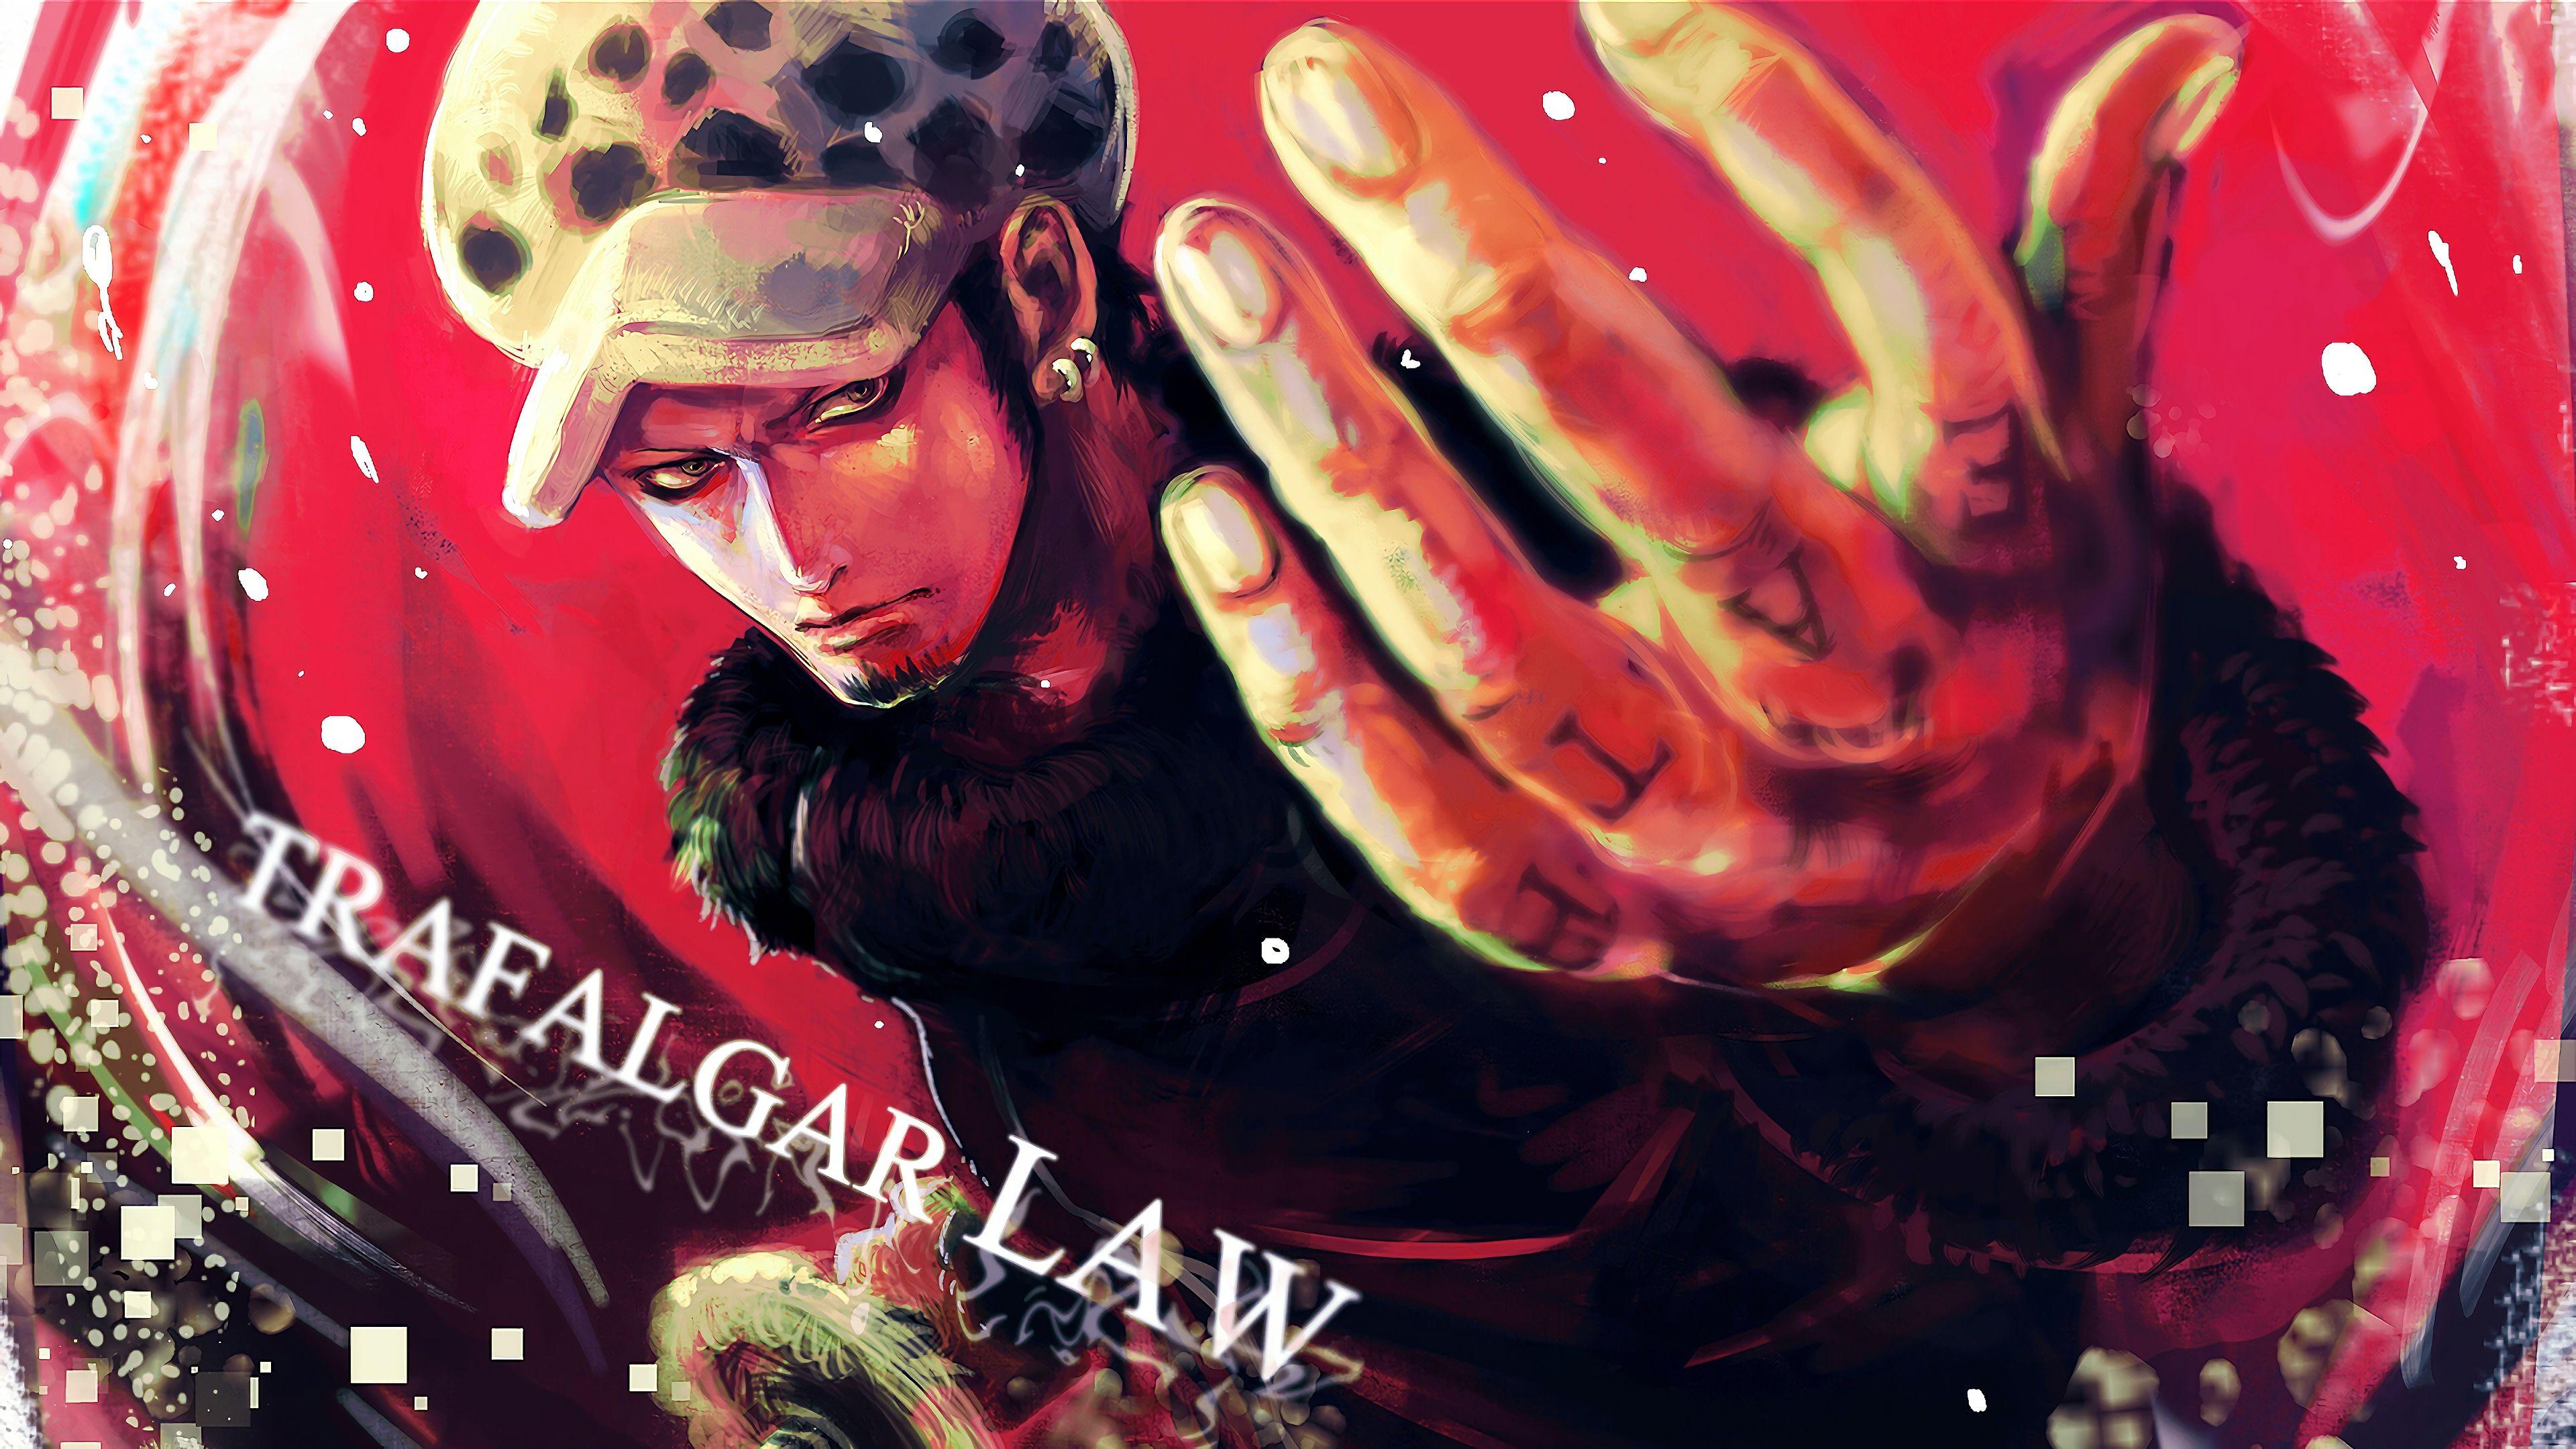 Trafalgar D Water Law One Piece Anime 3840x2160 Wallpaper Trafalgar Law Trafalgar Law One Piece Trafalgar